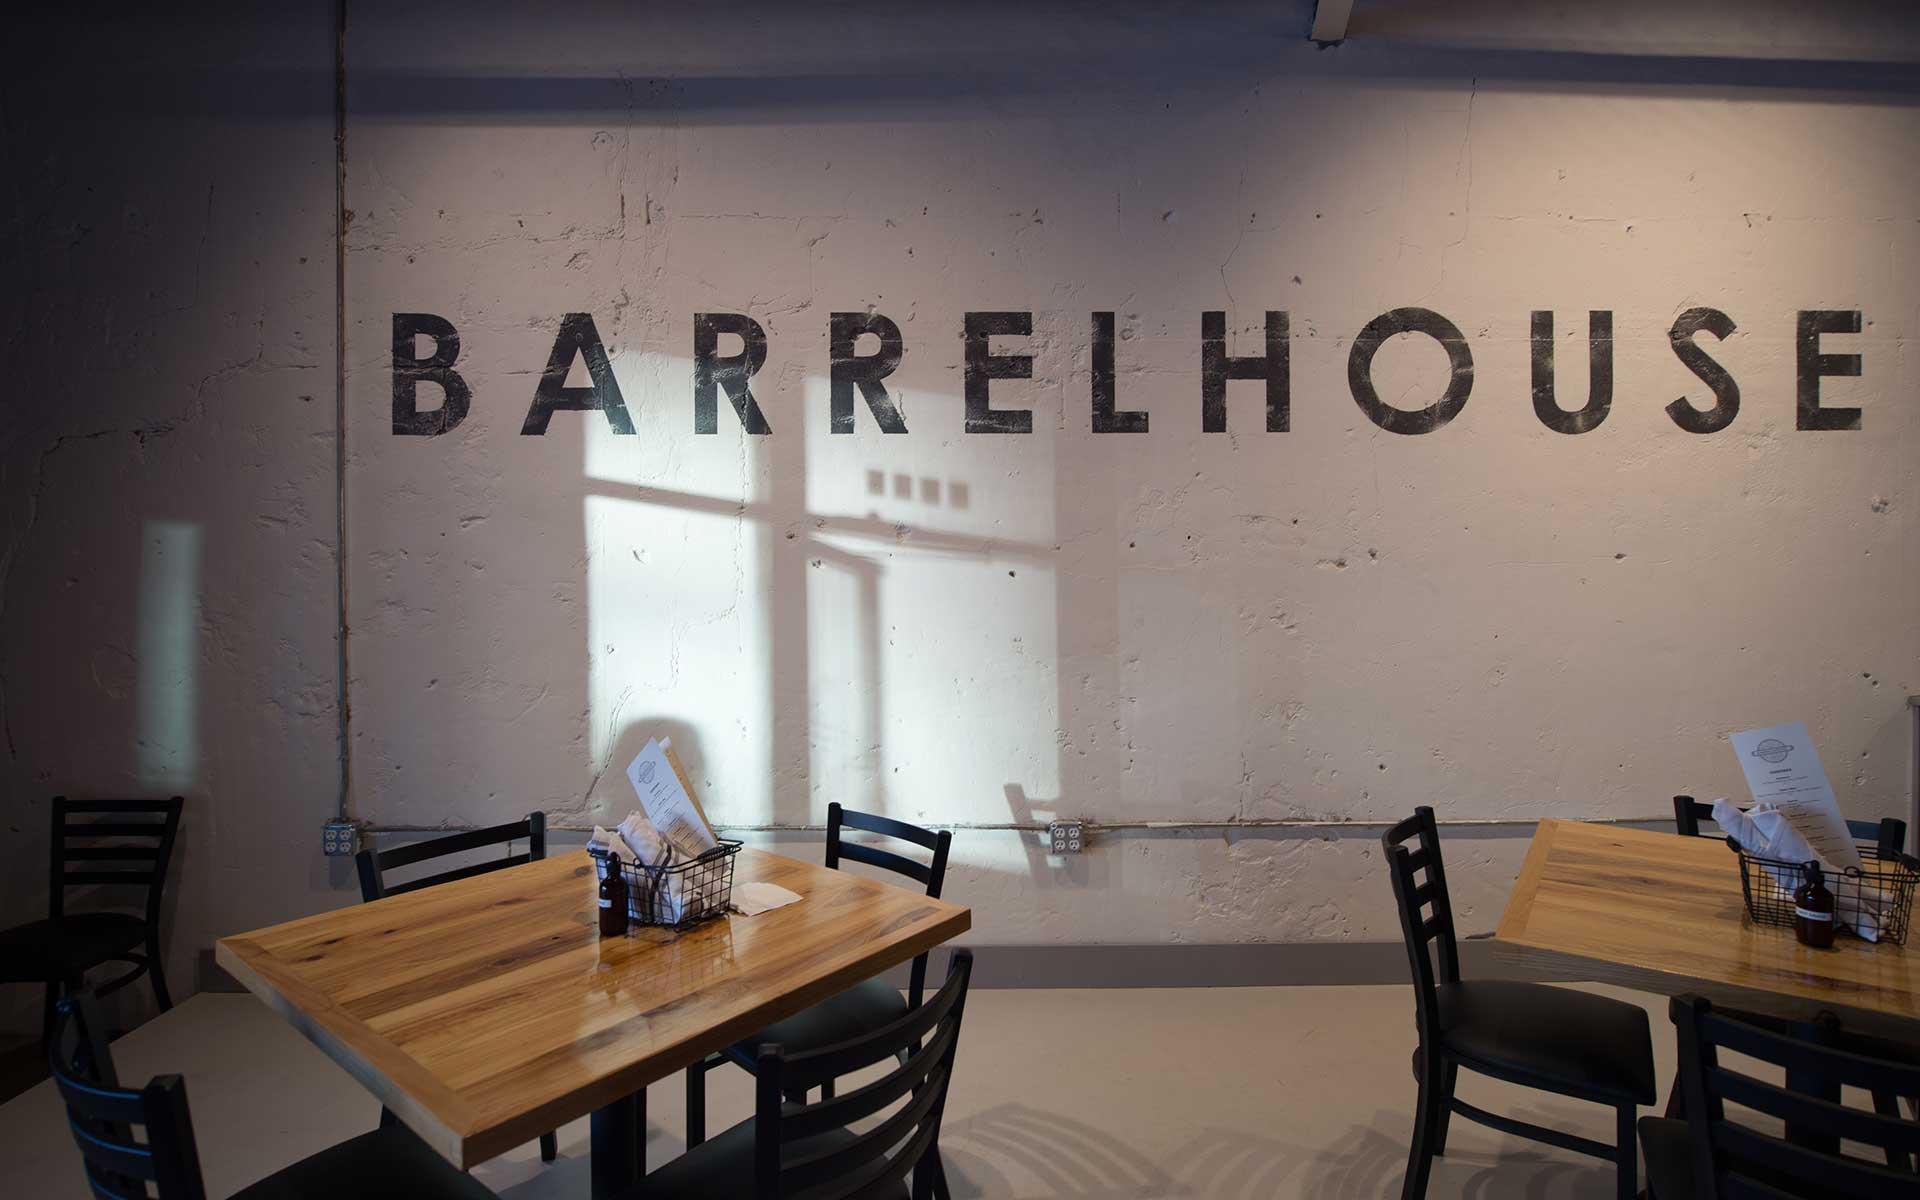 barrelhouse_1.jpg